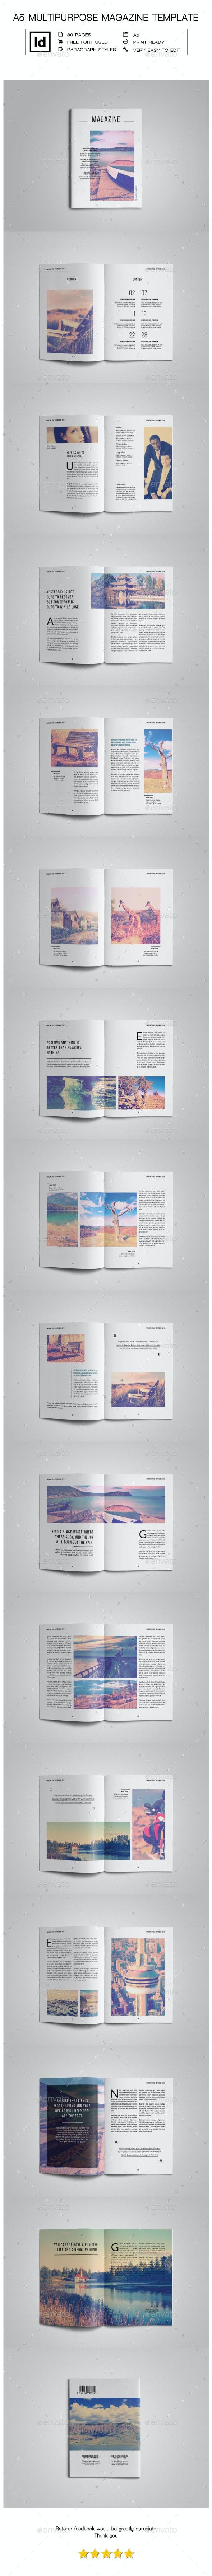 A5 Multipurpose Magazine Template II - Magazines Print Templates